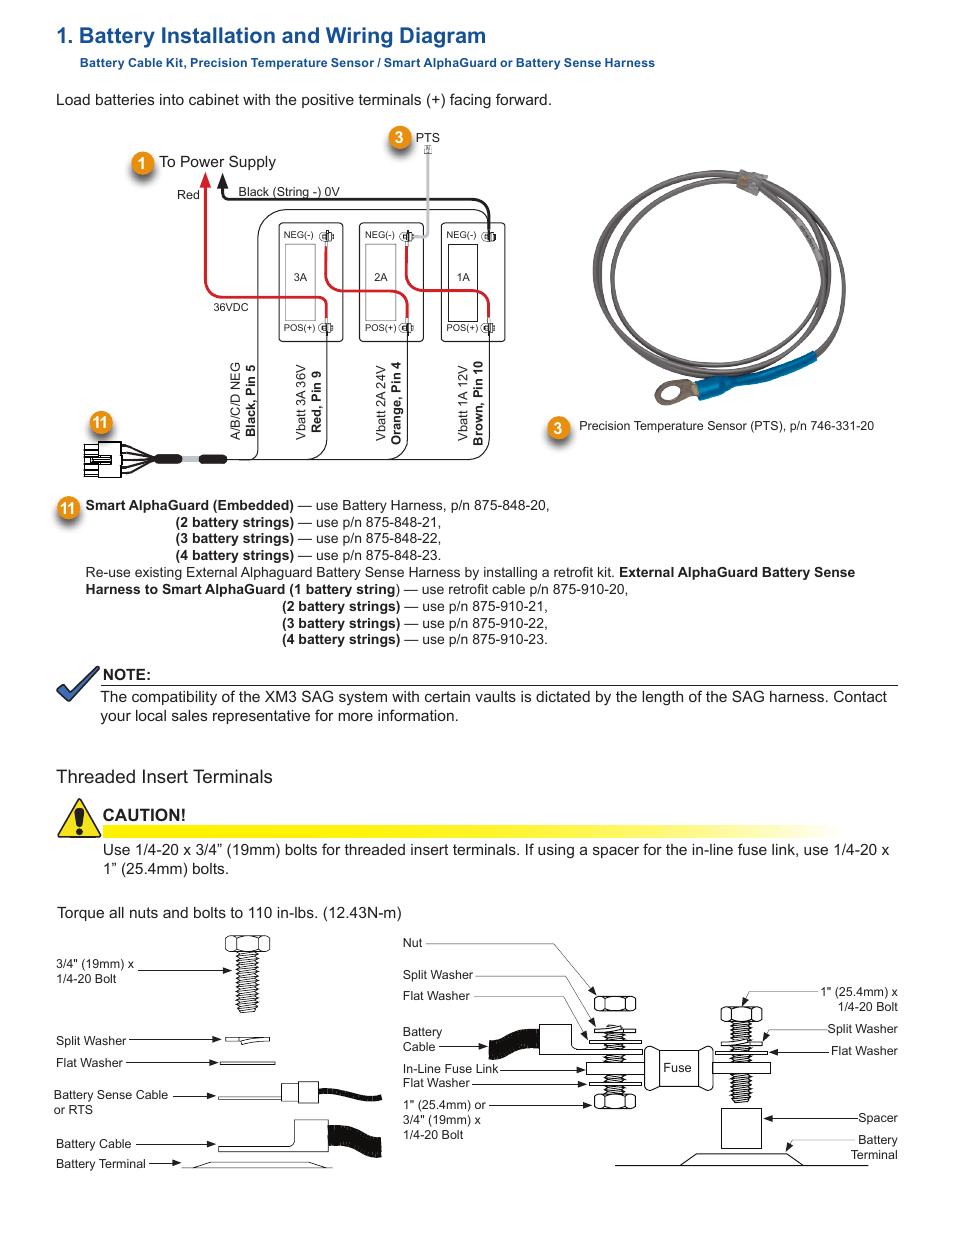 medium resolution of battery installation and wiring diagram threaded insert terminals caution alpha technologies xm3